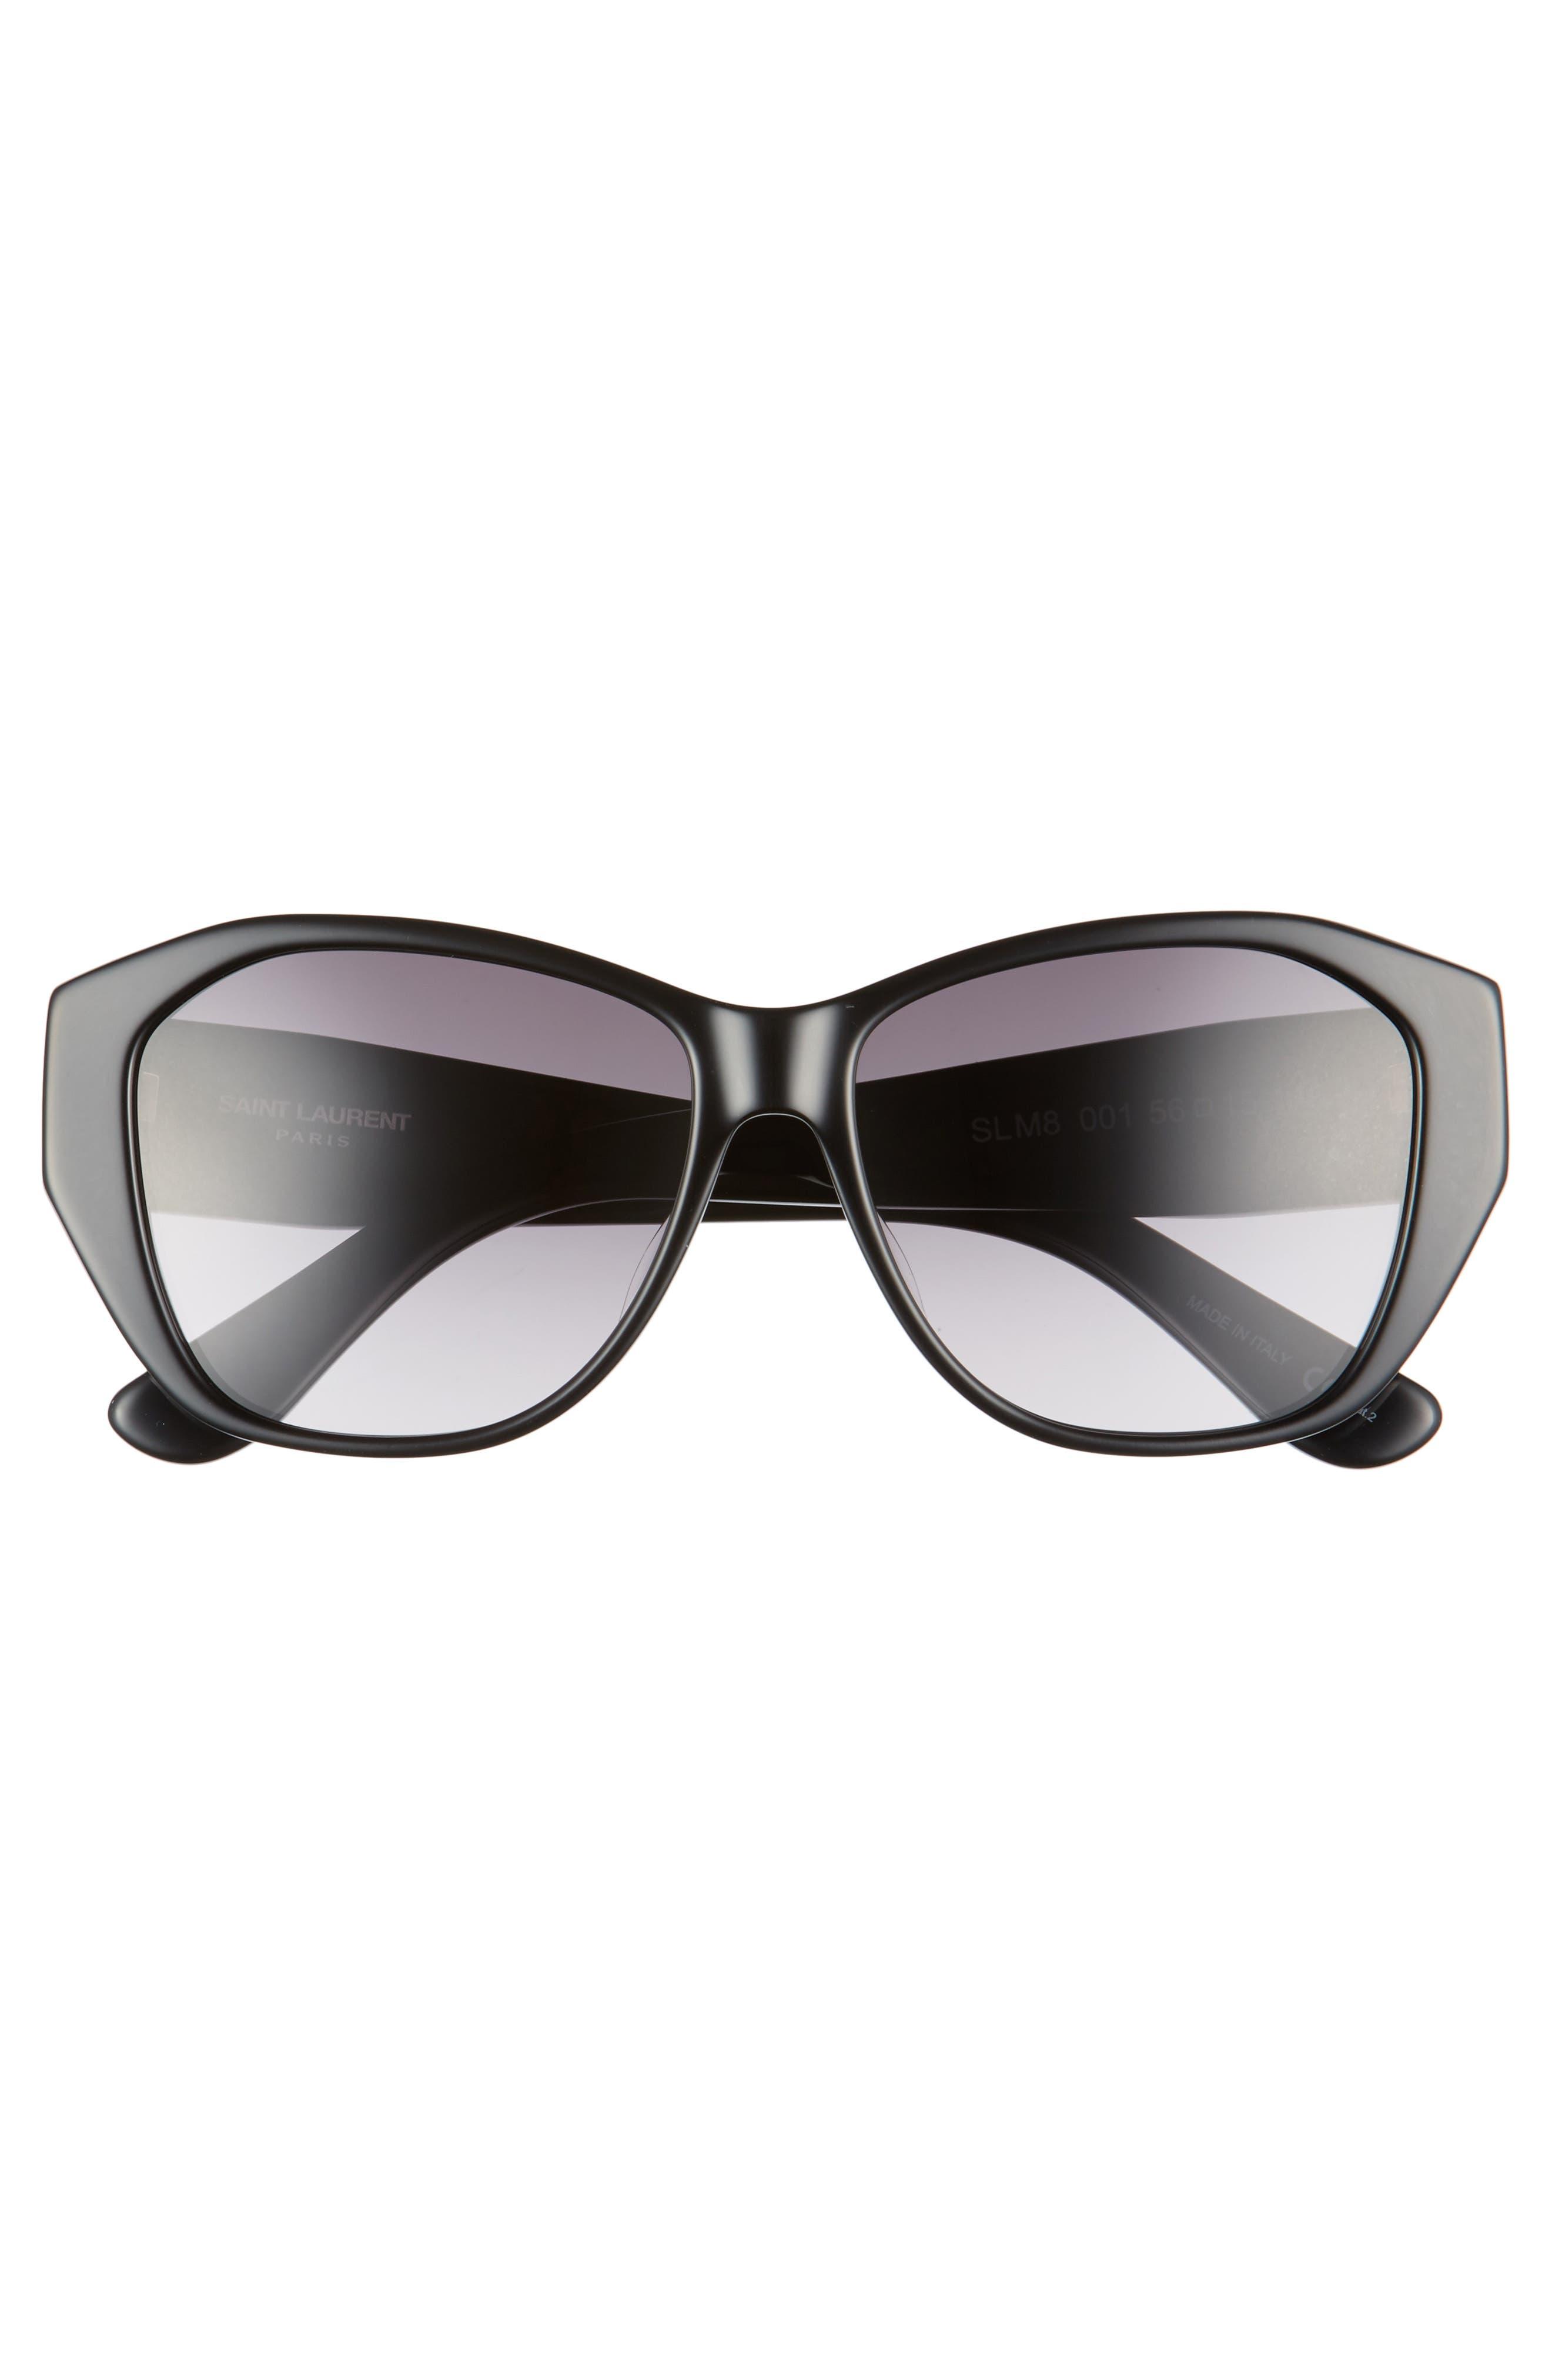 56mm Sunglasses,                             Alternate thumbnail 3, color,                             Black/ Black/ Grey